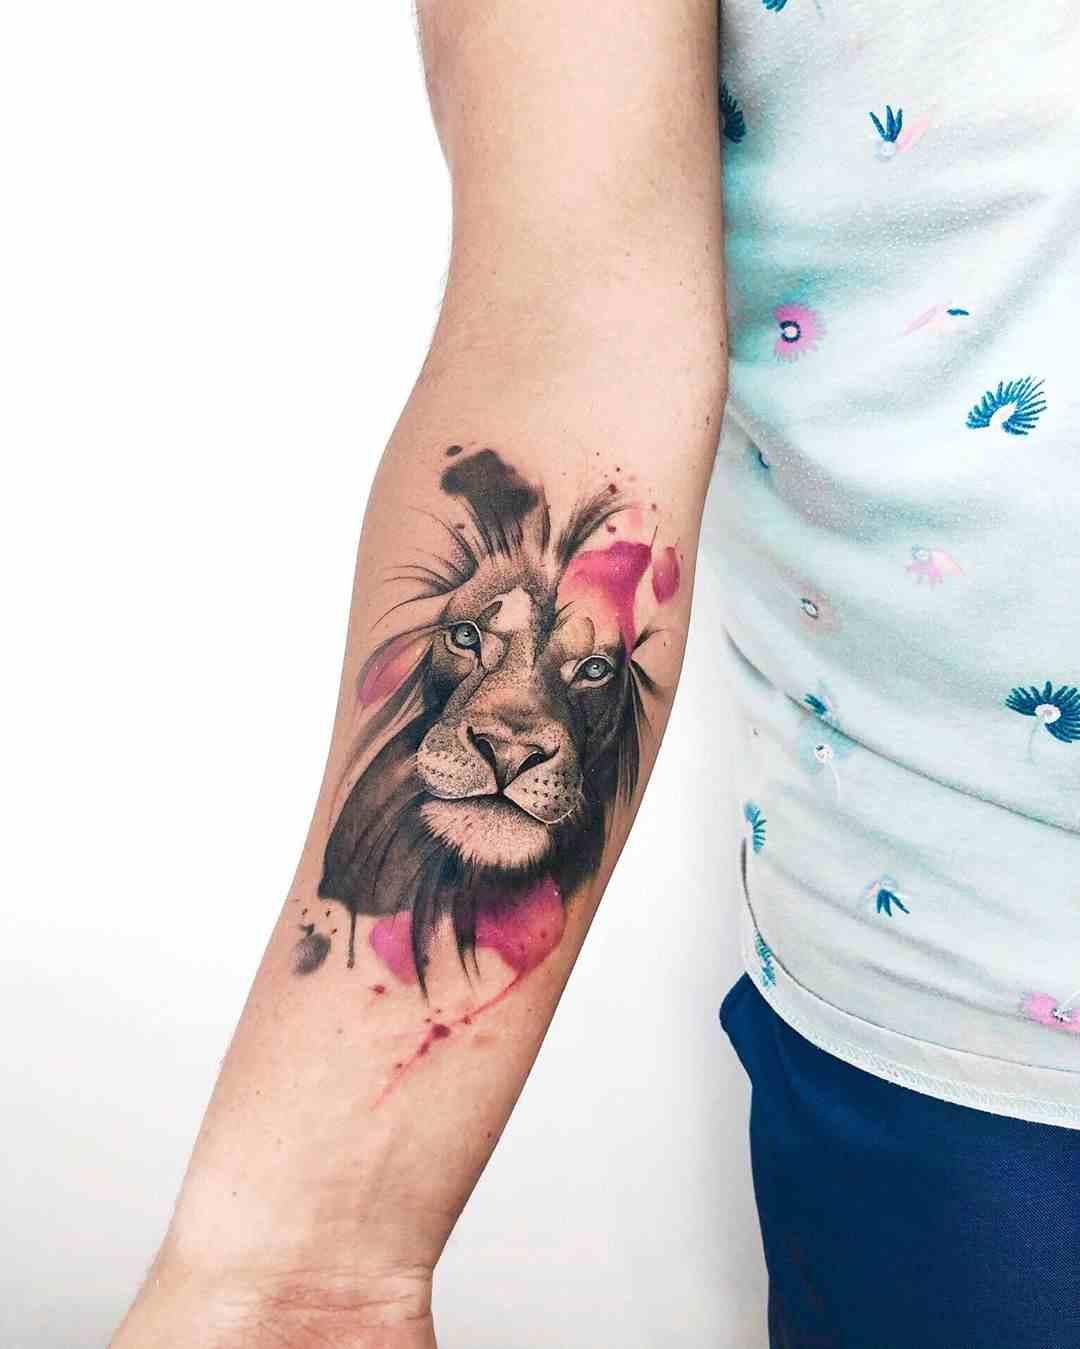 Imagen de tatuaje de león acuarela para mujer